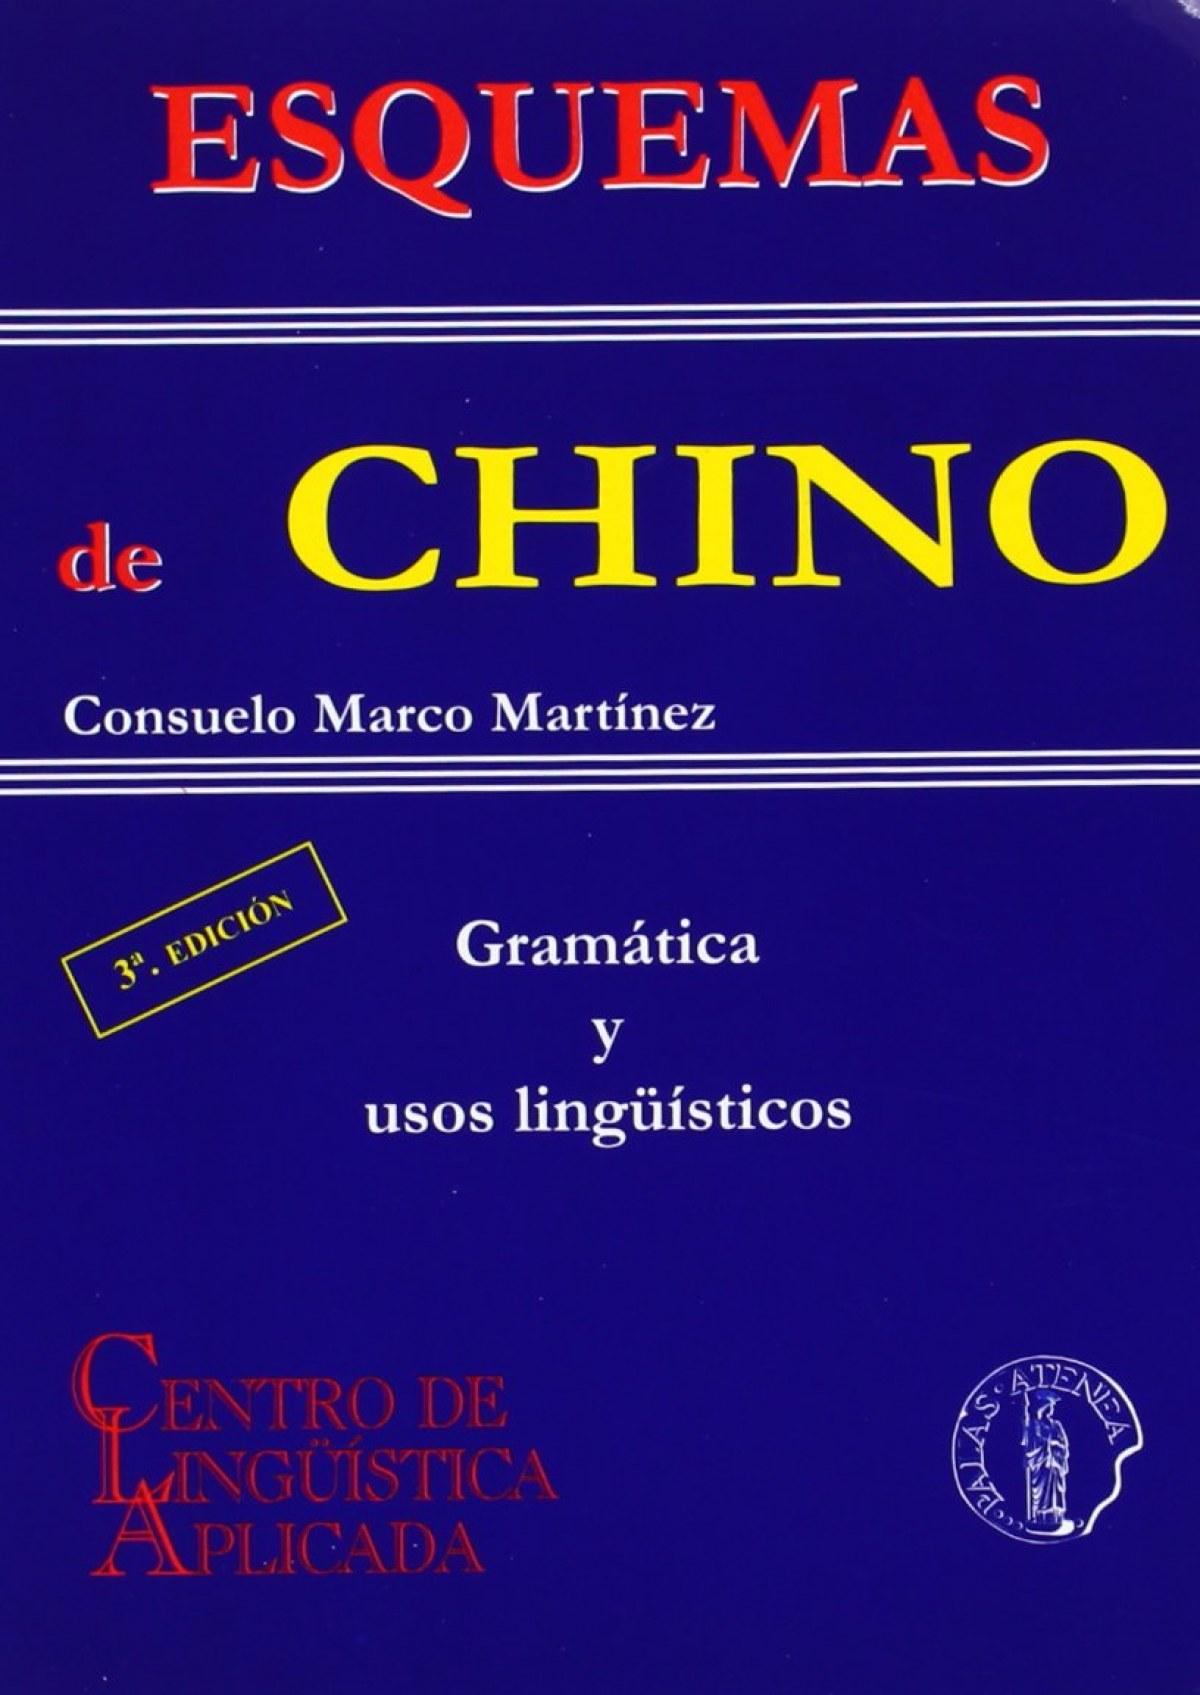 Esquemas de chino: gramatica y usos linguisticos 9788495855756